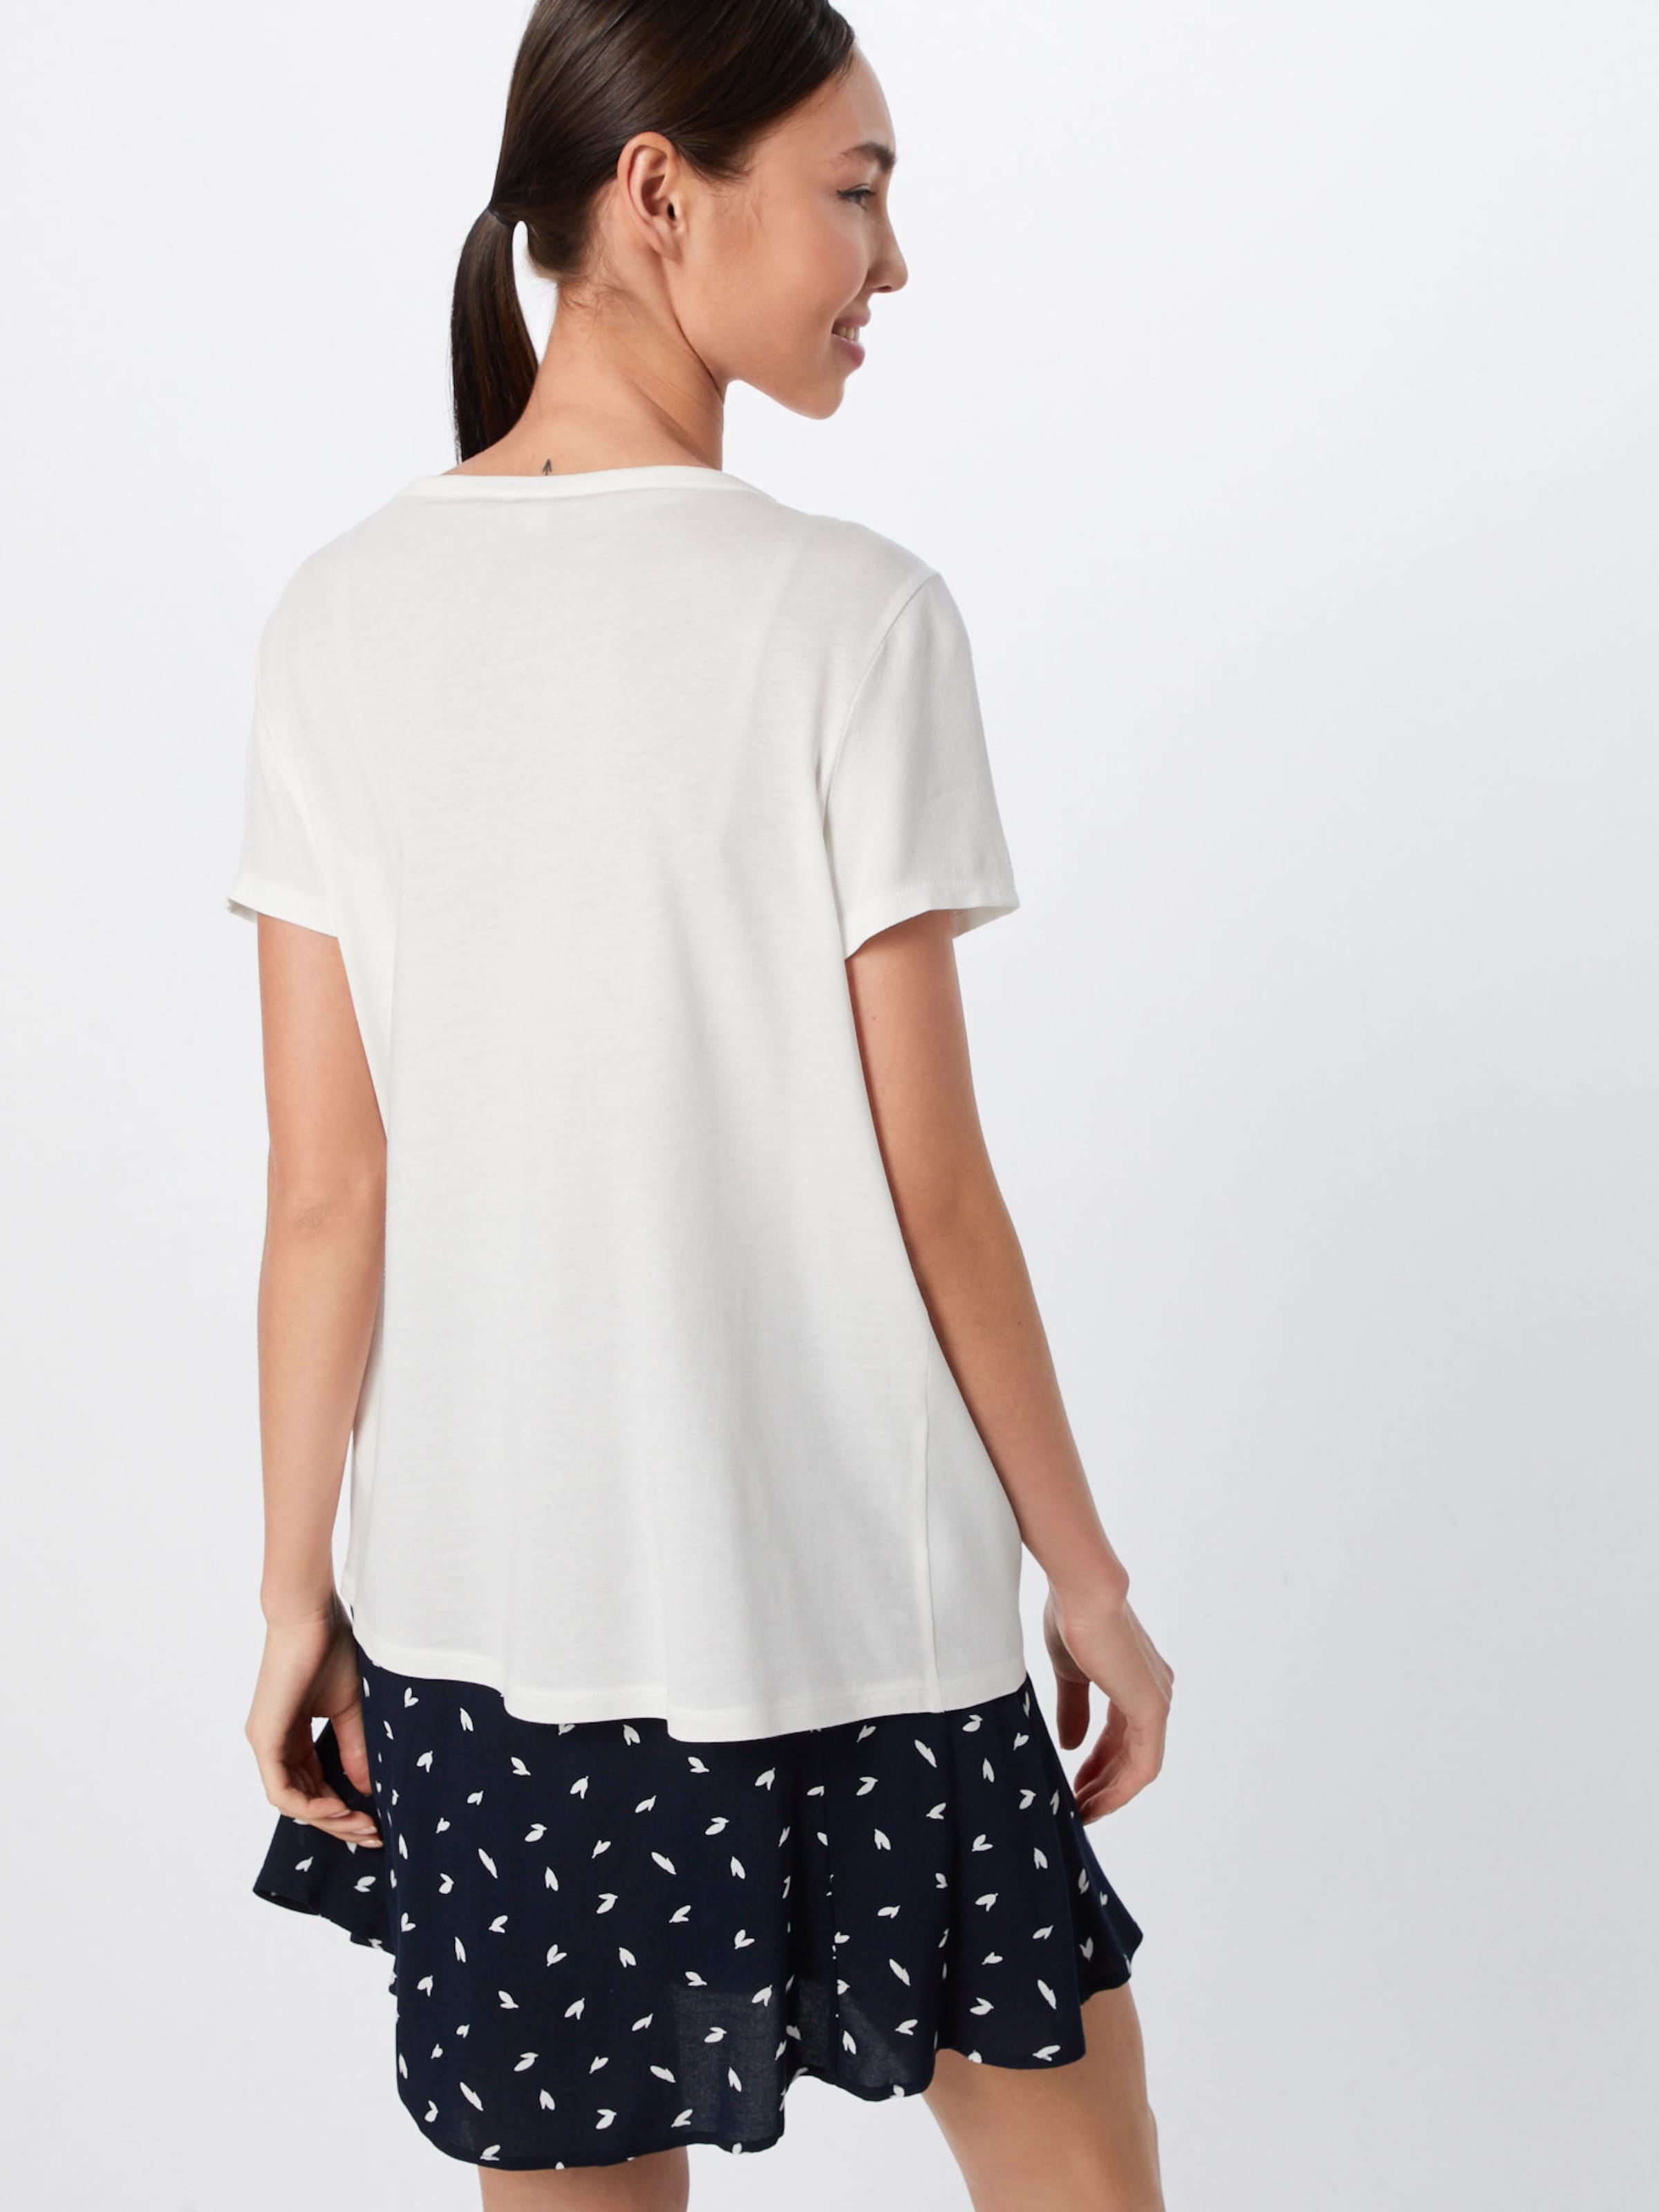 Tailor En Tom T shirt Blanc cTKJ3lF1